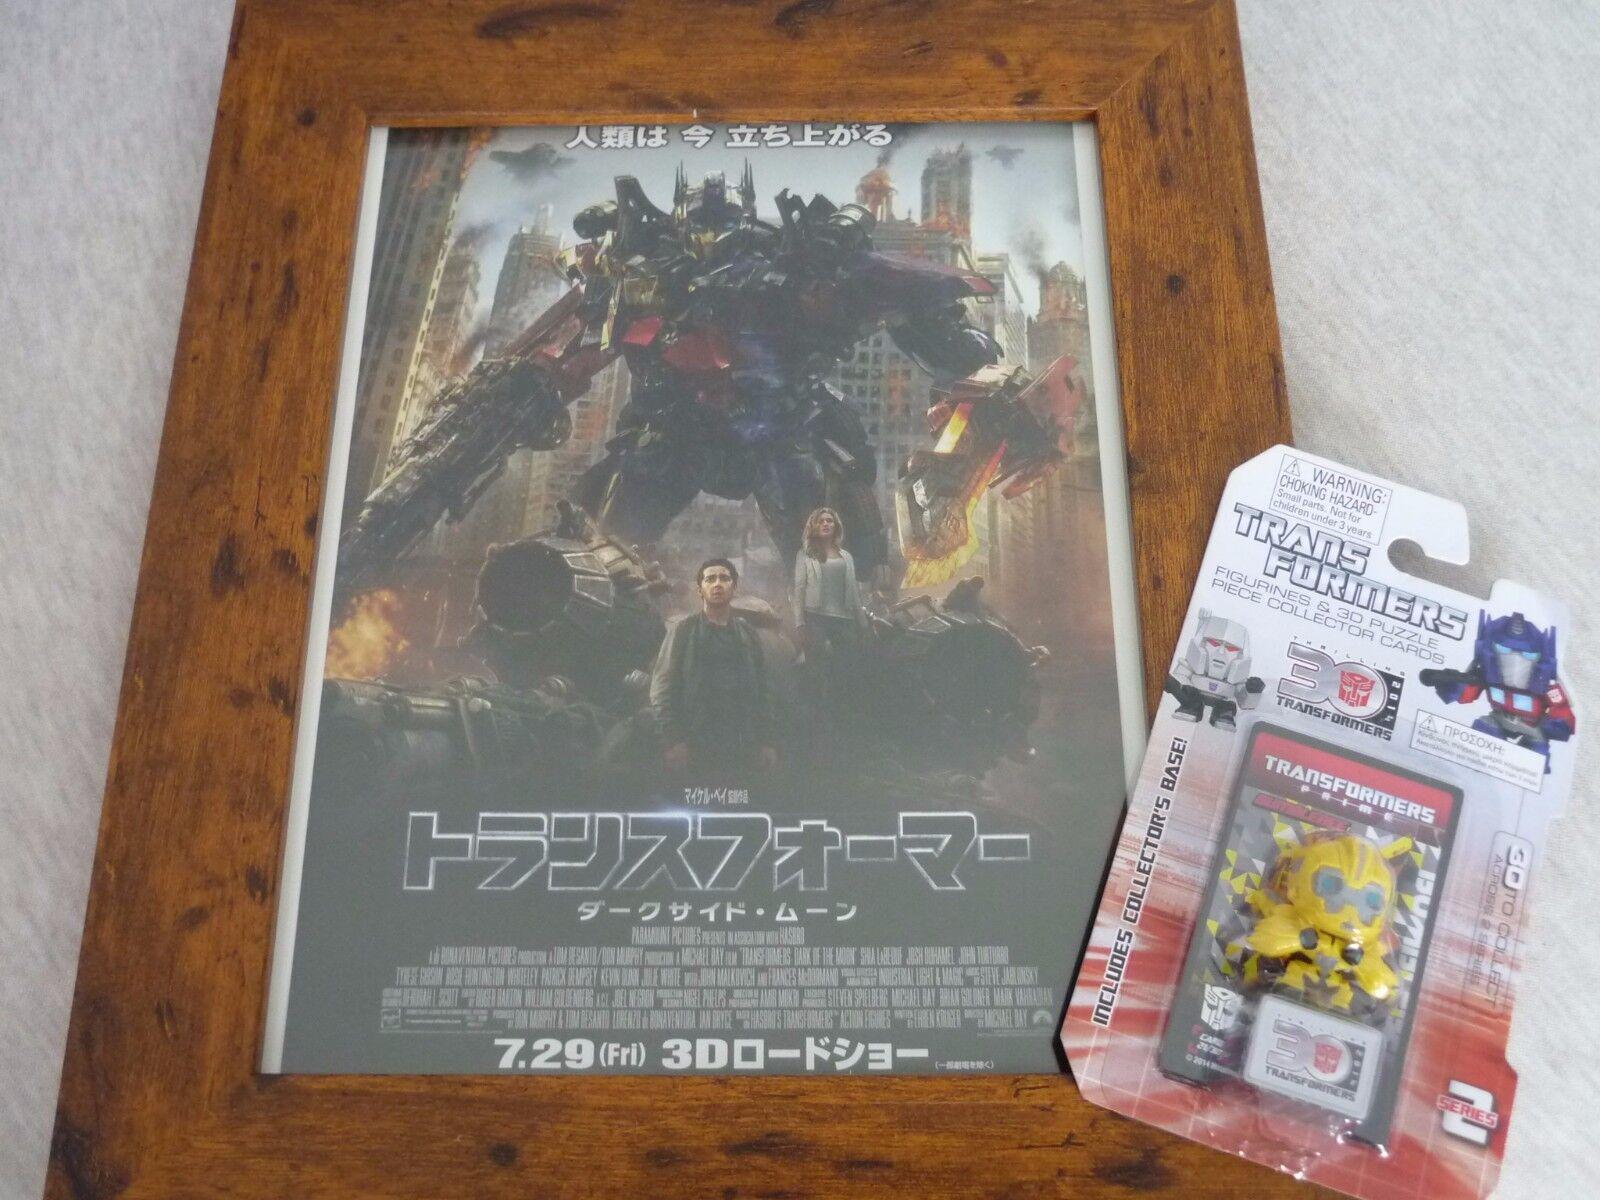 Framed 10x8 japan poster flyer transformers dark of the moon + Bumblebee figure